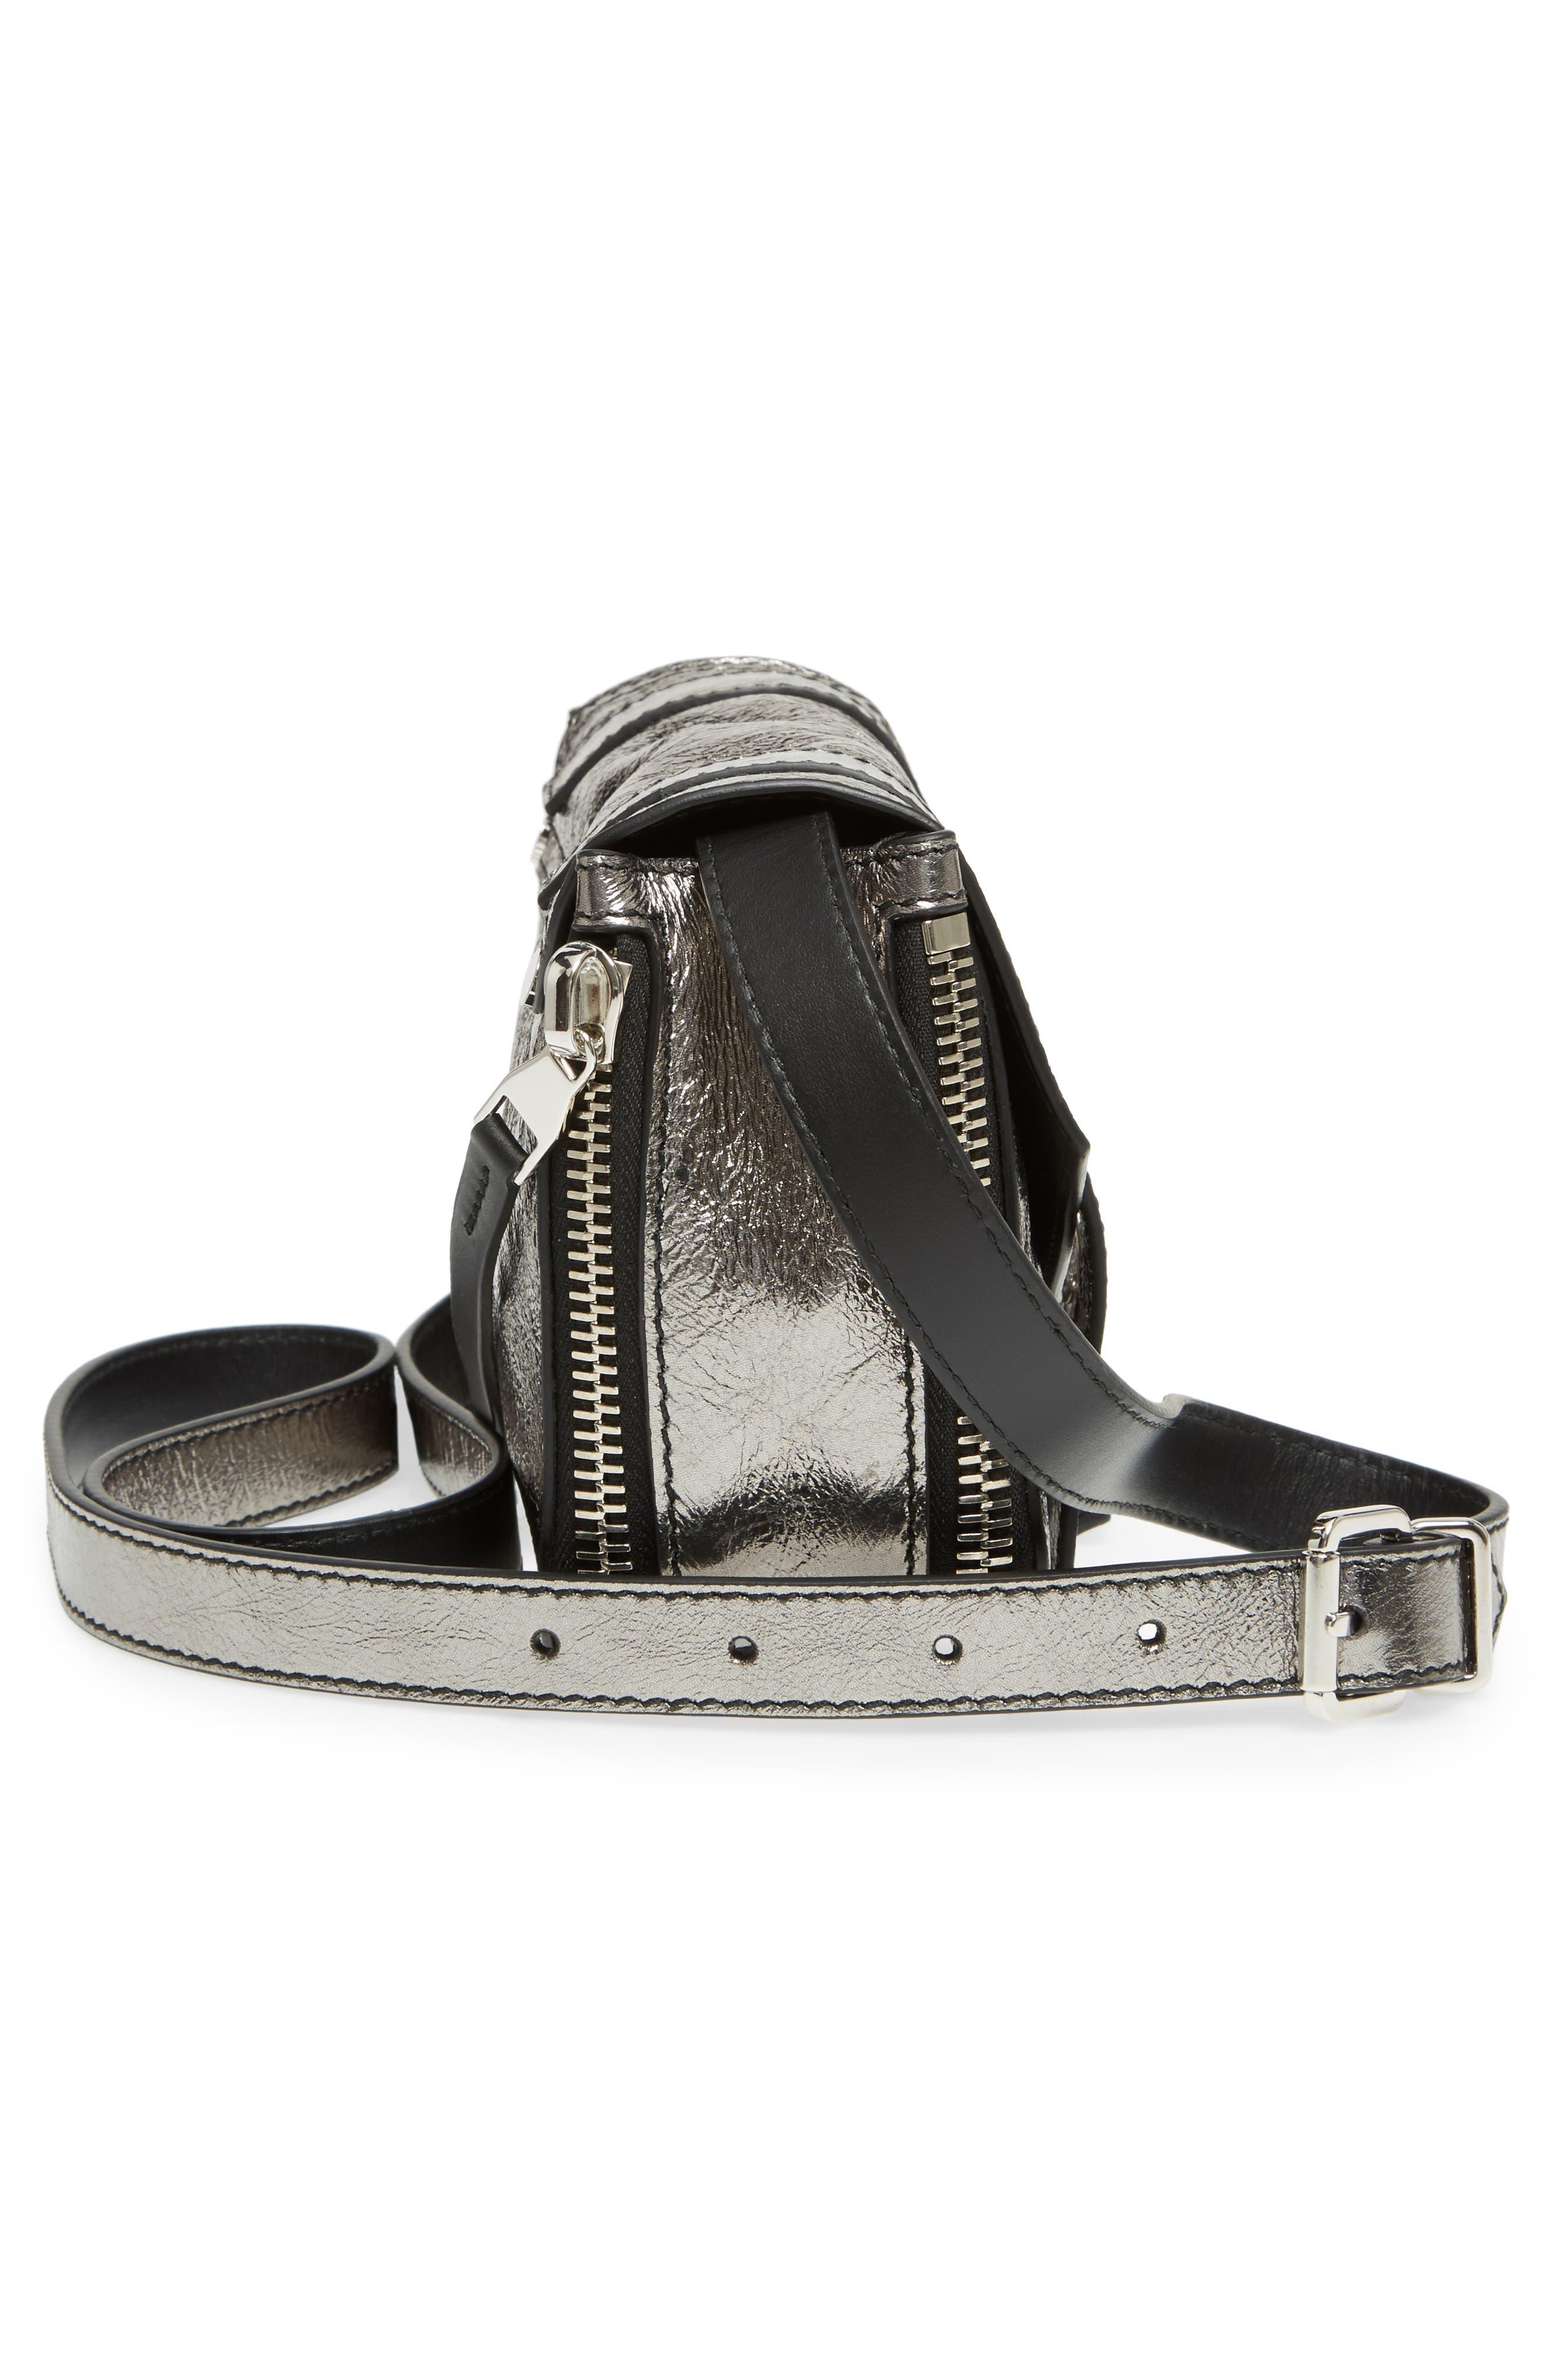 Mini PS1 Metallic Leather Crossbody Bag,                             Alternate thumbnail 5, color,                             Dark Silver